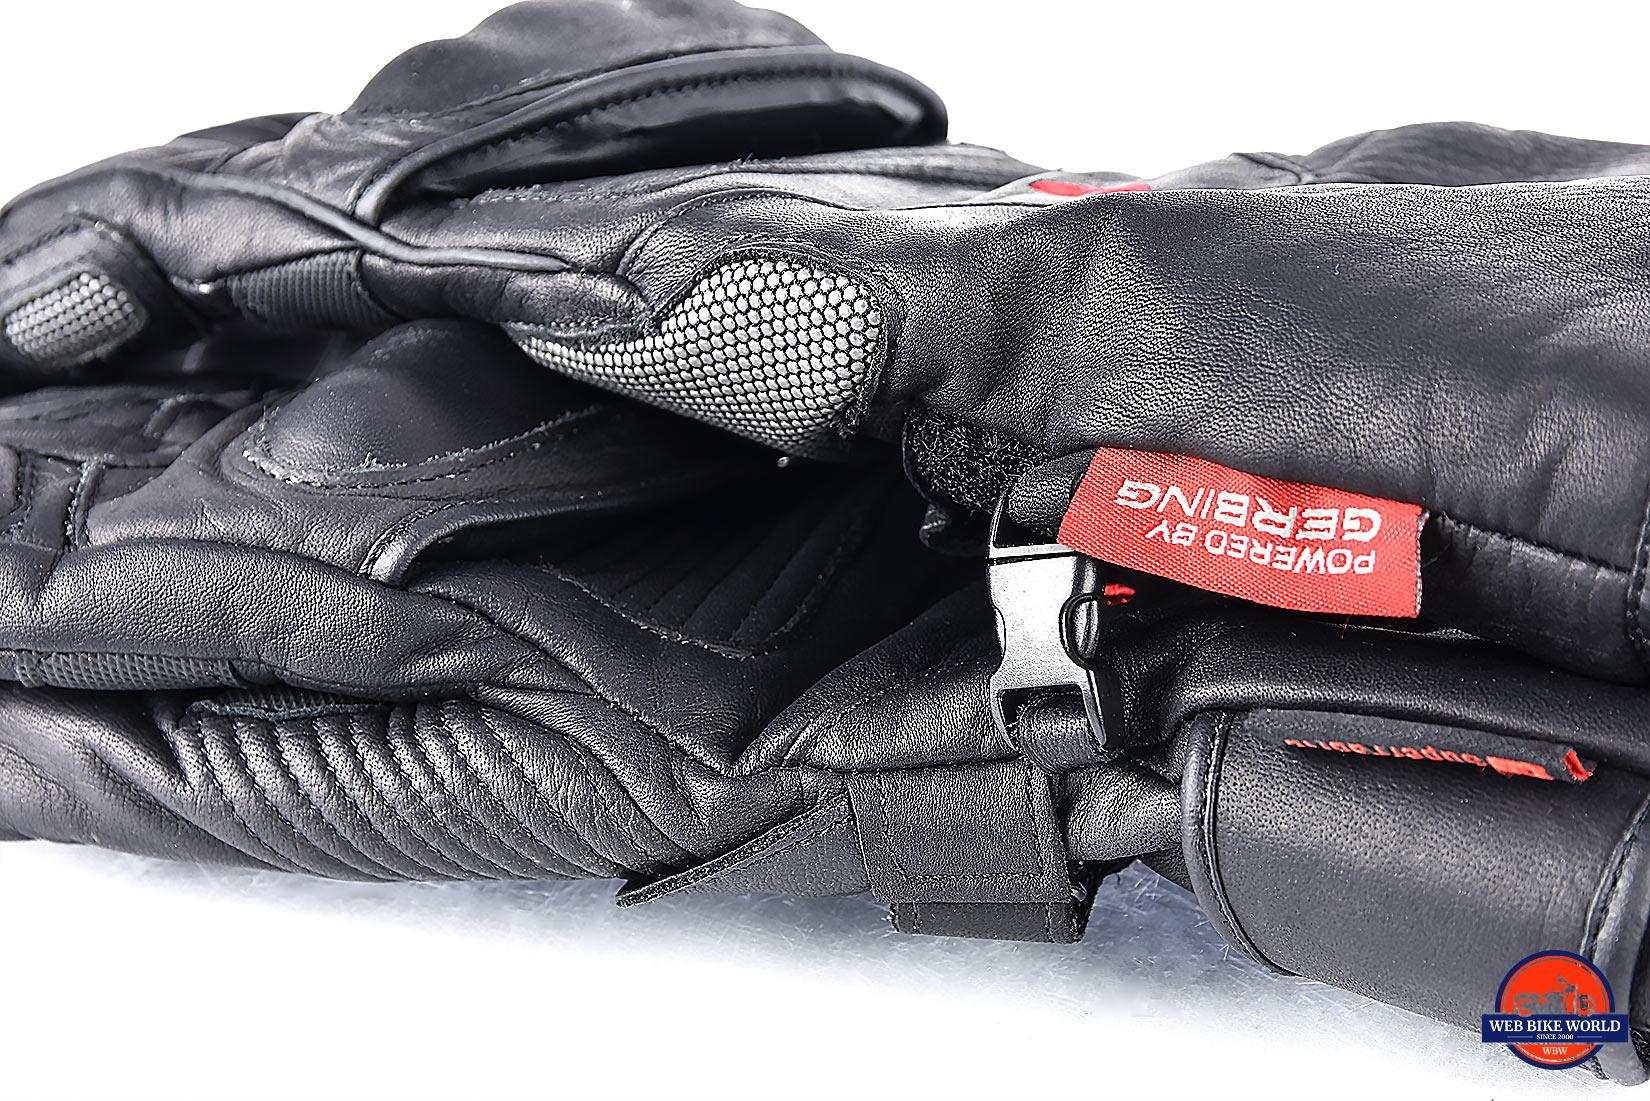 The Gerbing Vanguard heated motorcycle gloves